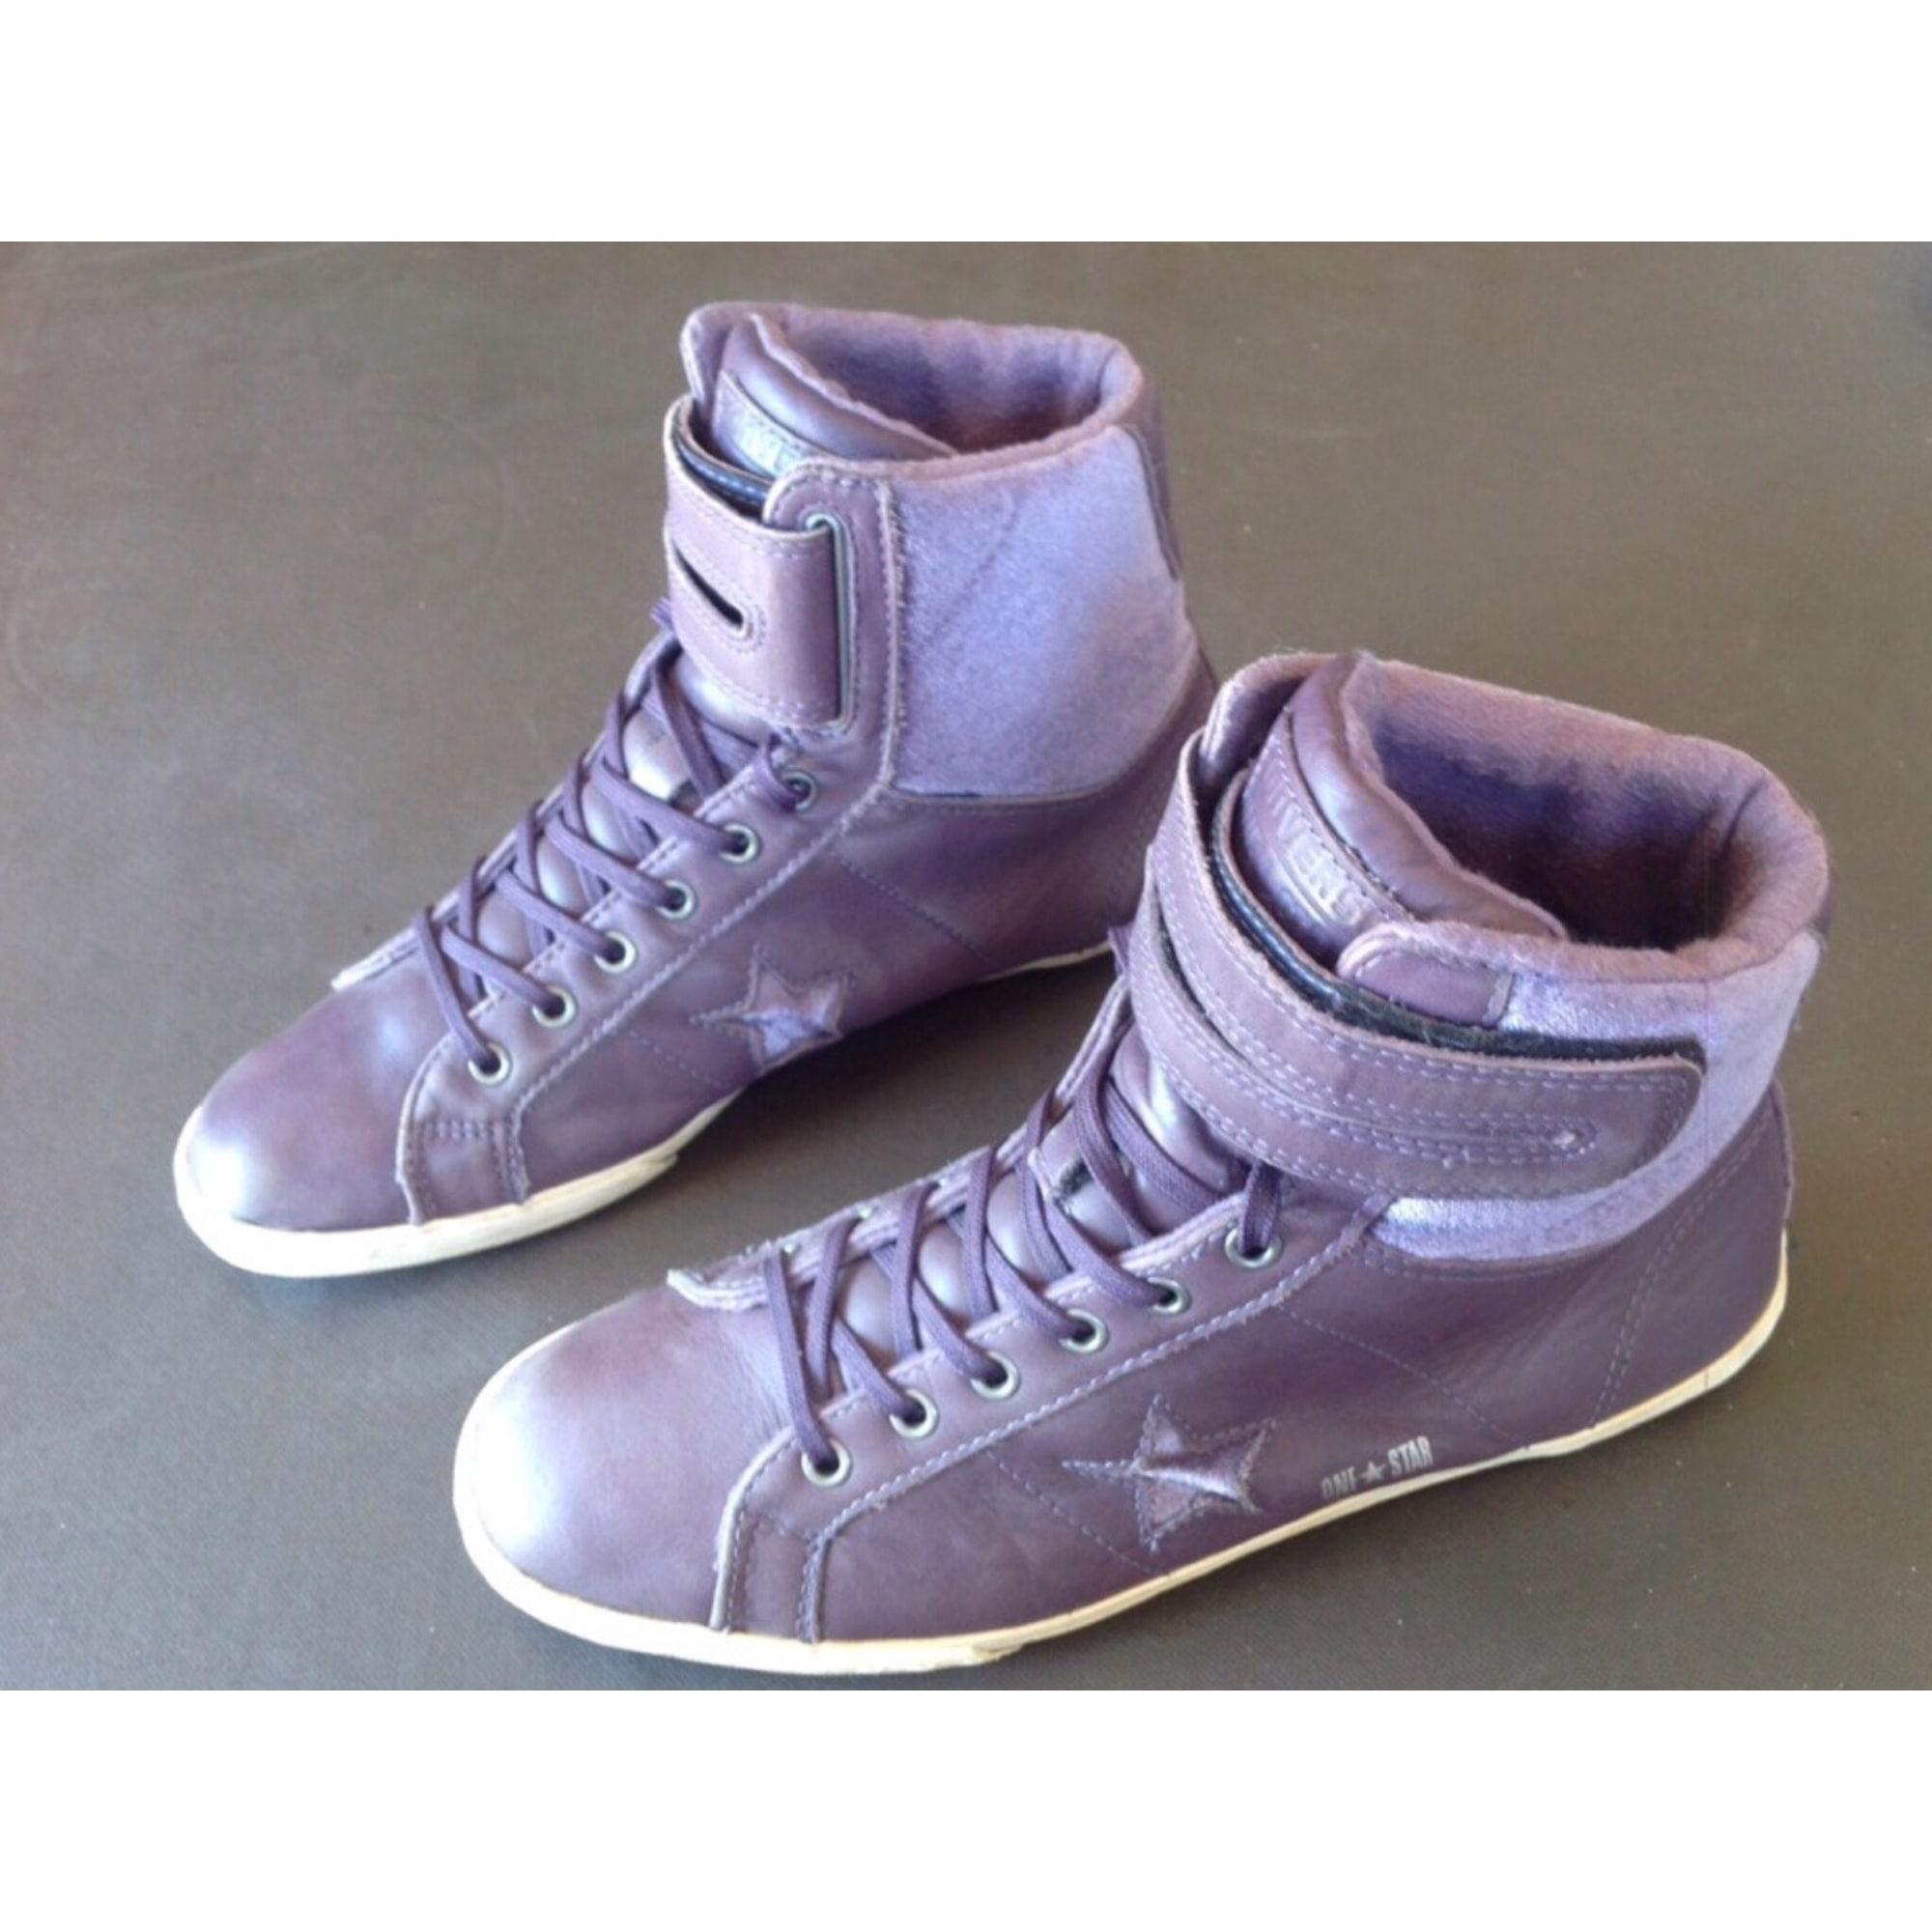 converse femme violet lavande 38